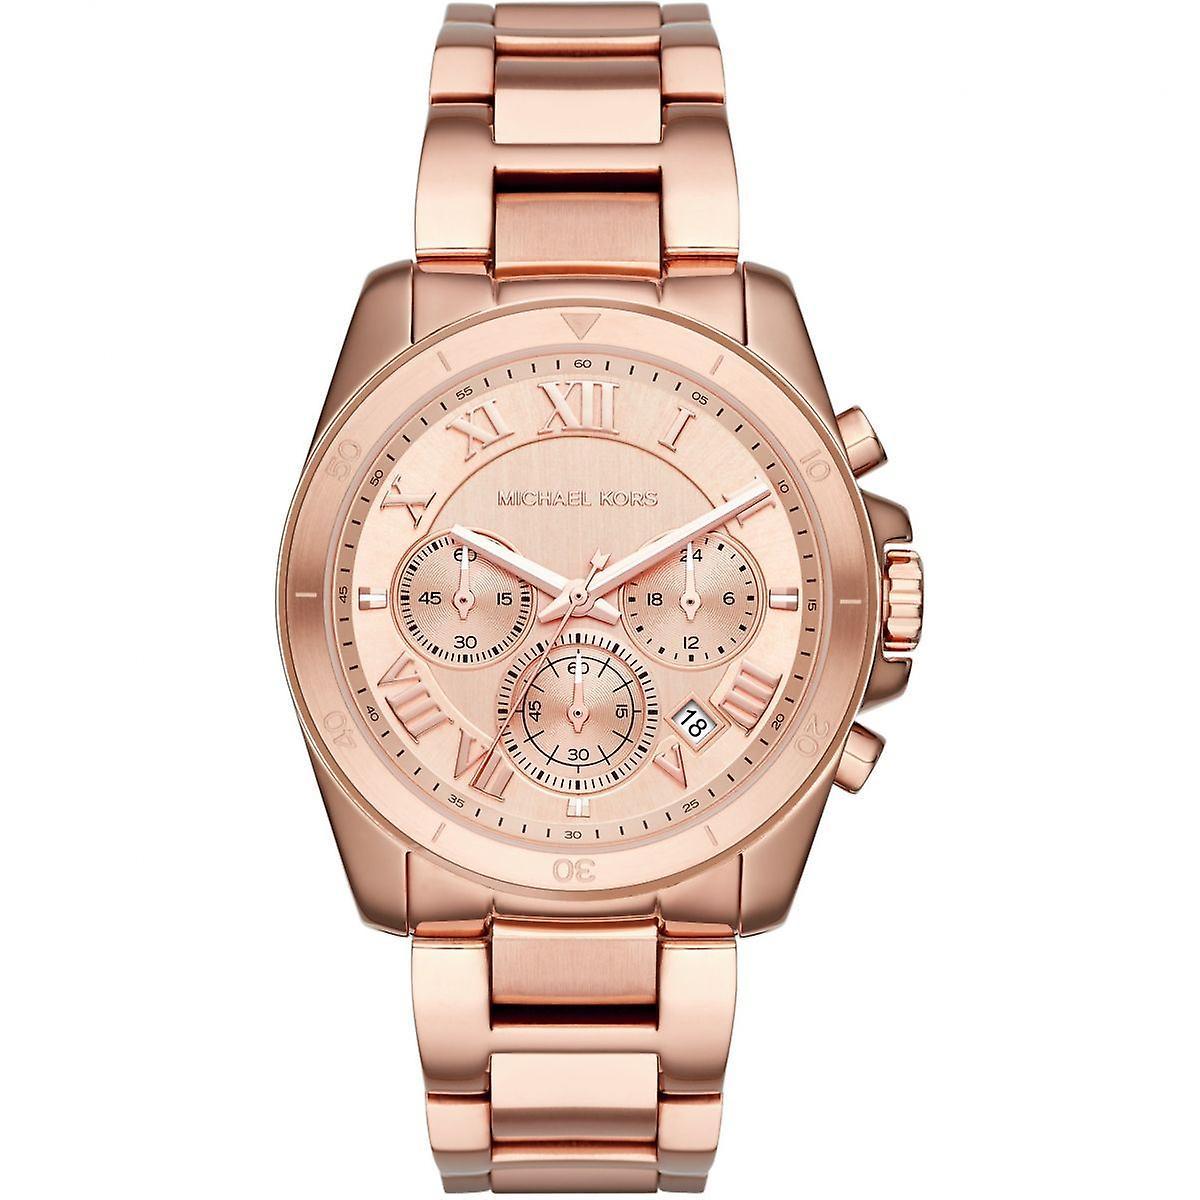 Michael Kors Brecken Mesdames Womens chronographe or Wrist Watch MK6367